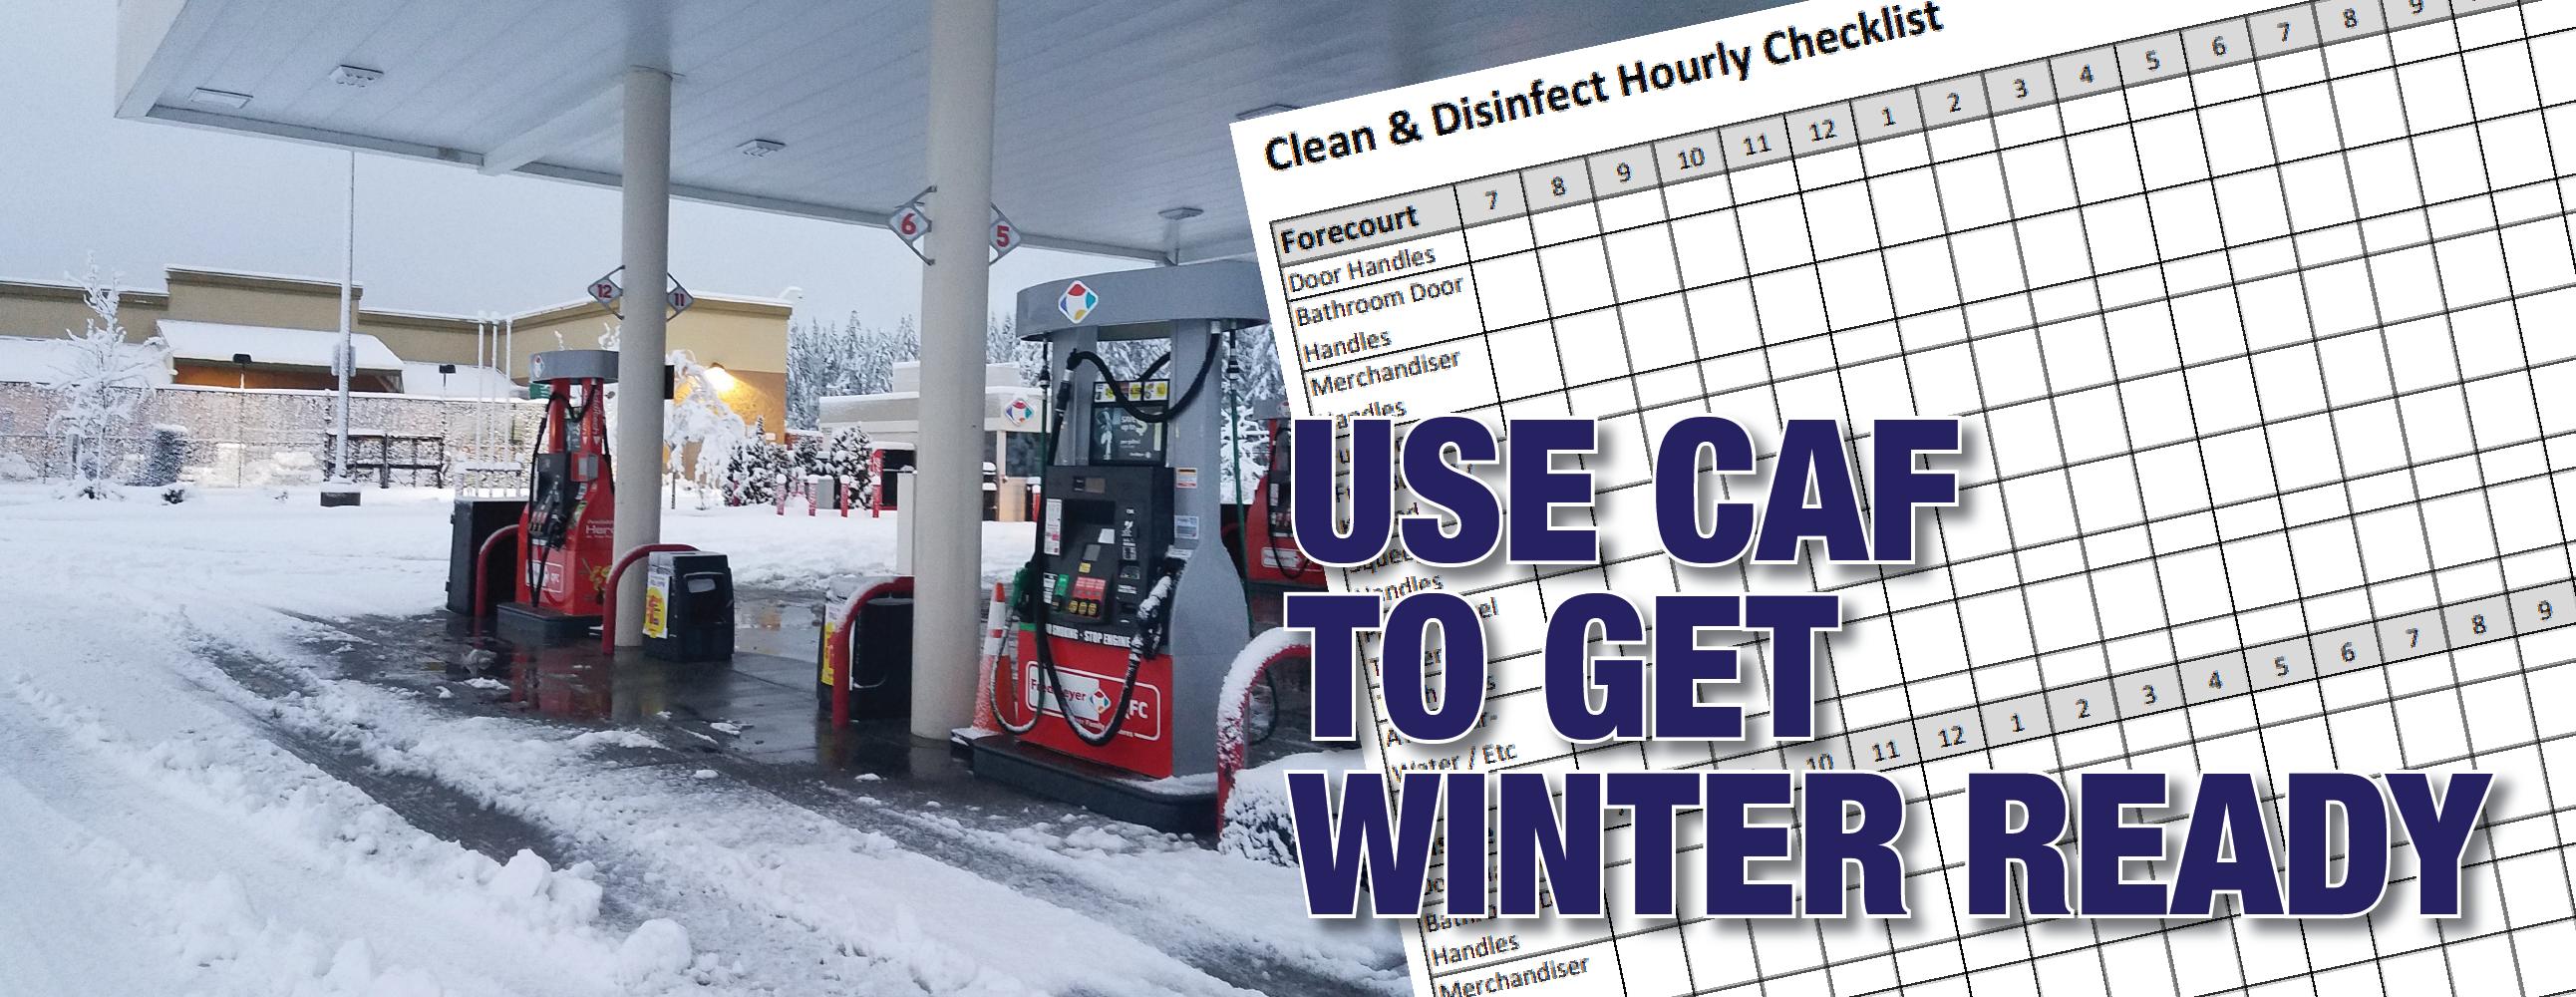 Winter Readiness Checklist